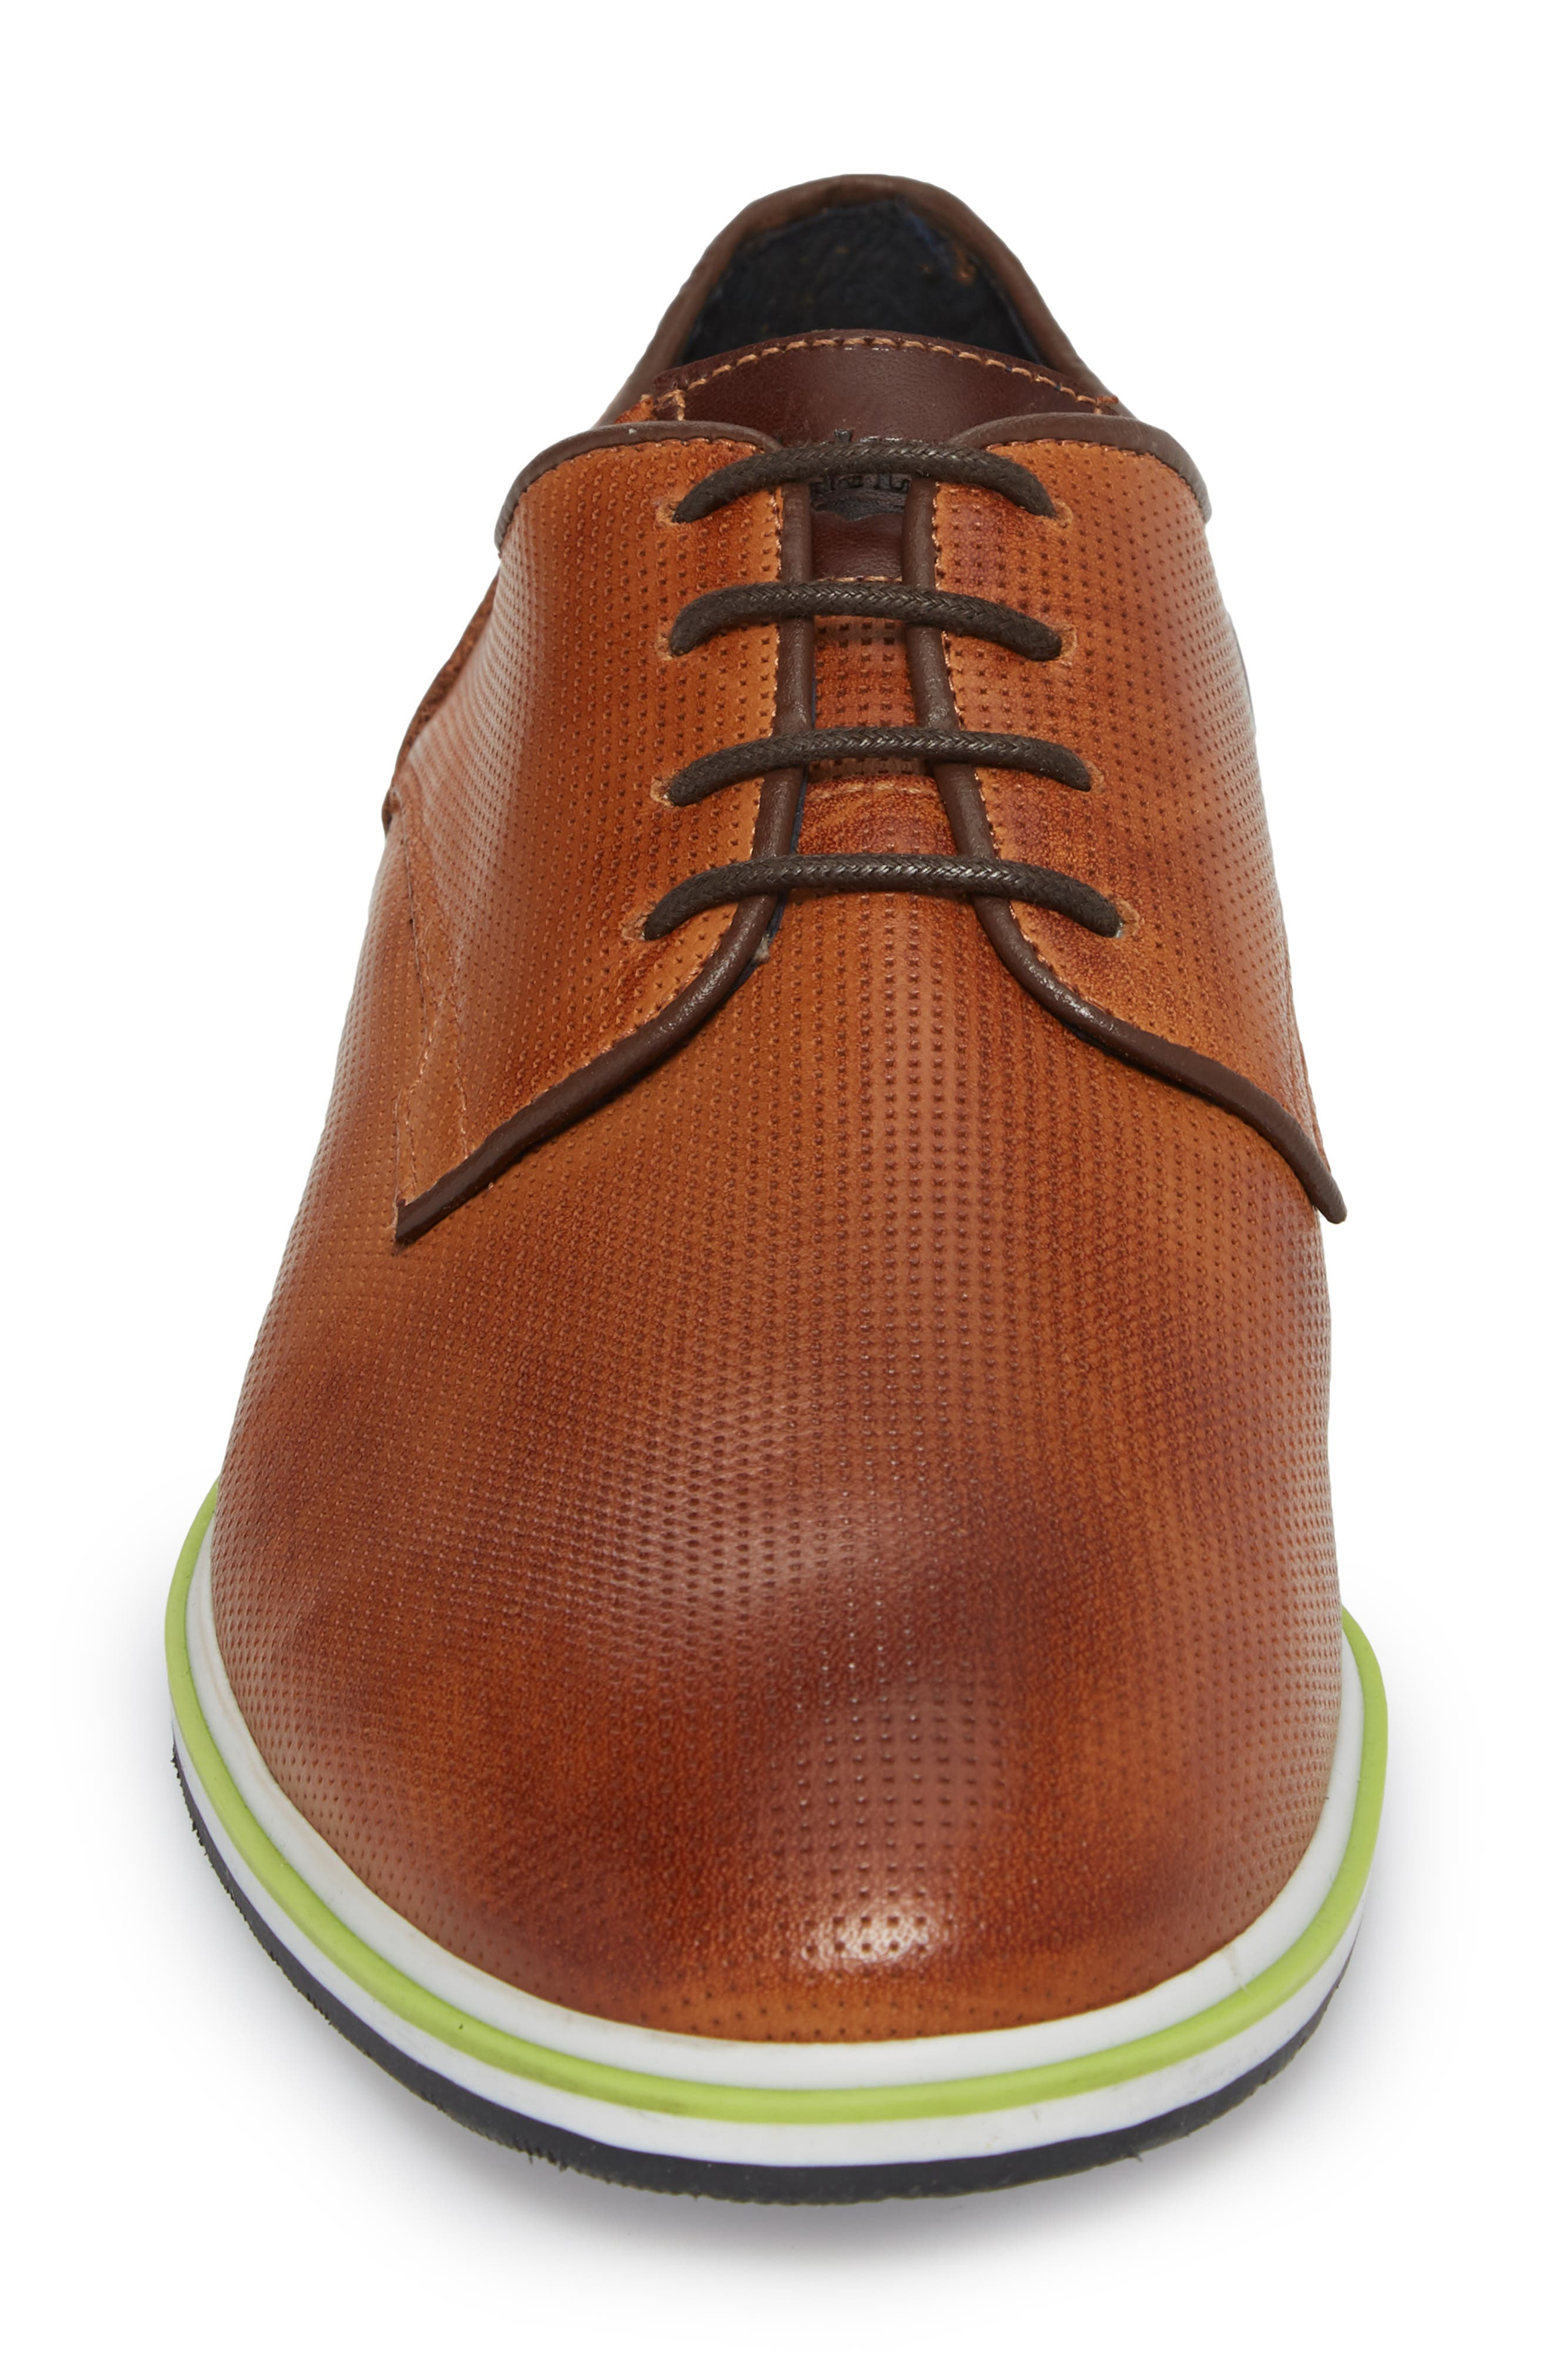 Plus Casual Perforated Derby,                             Alternate thumbnail 4, color,                             Cognac/ Dark Cognac Leather